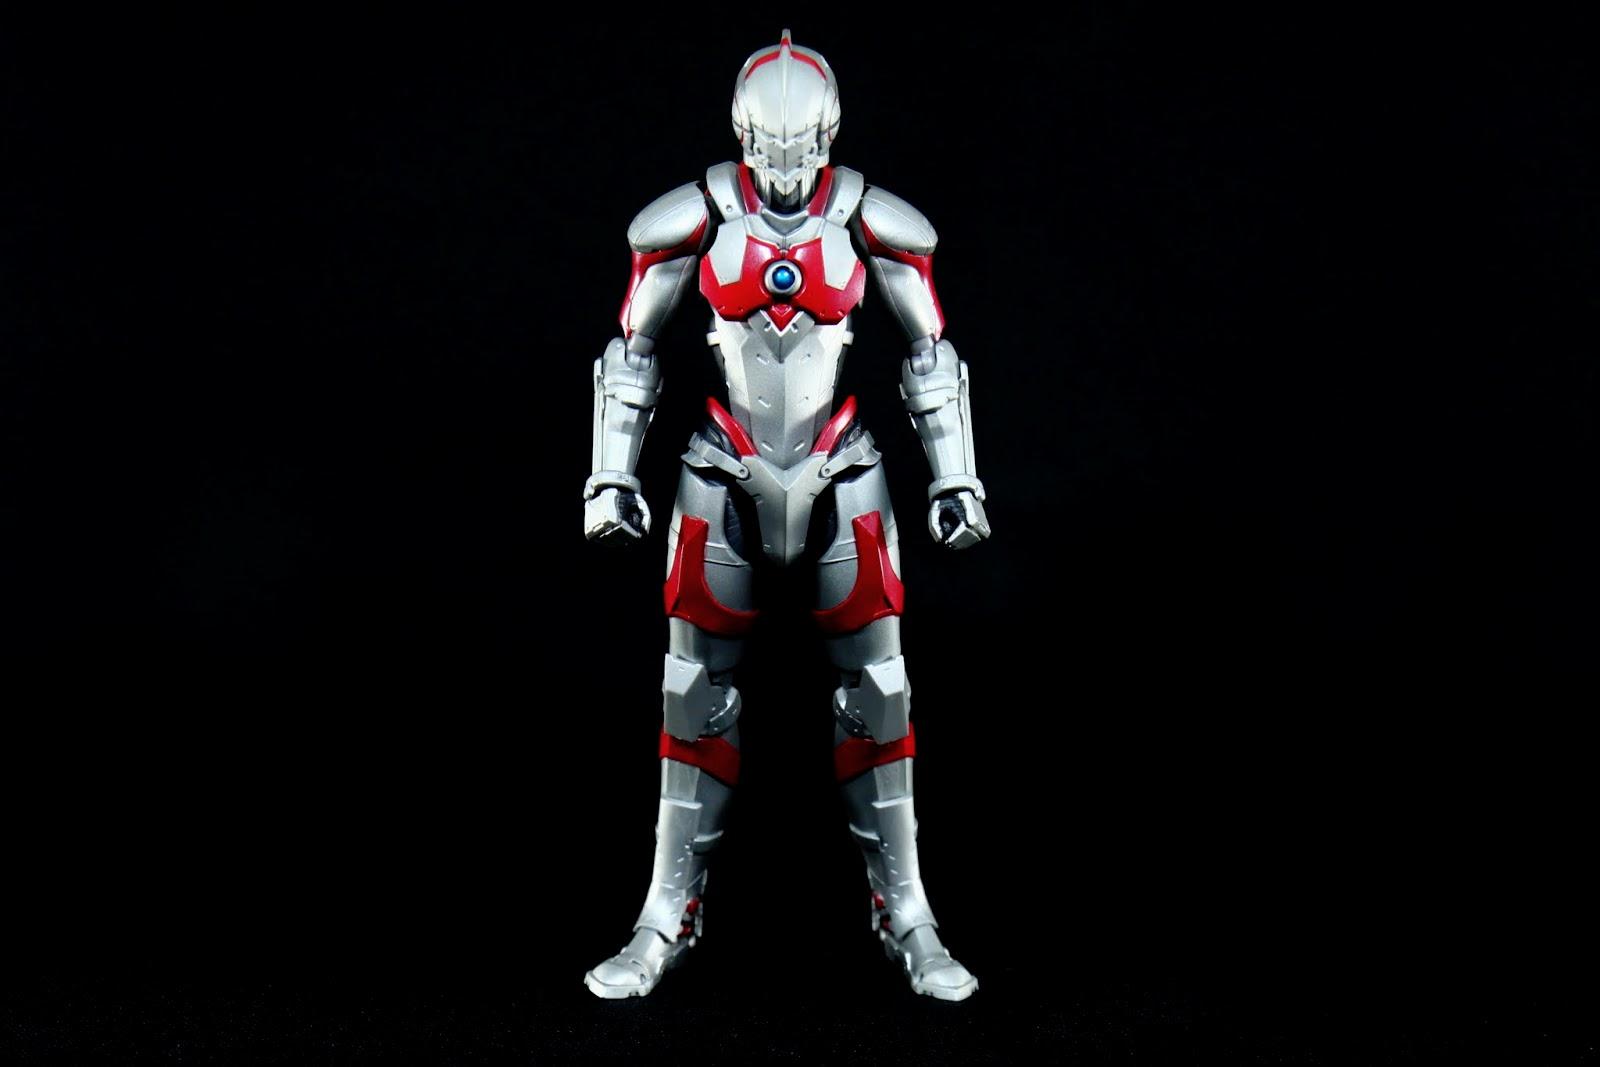 Ultraman本體, 非常素淨就是這次最大的缺點